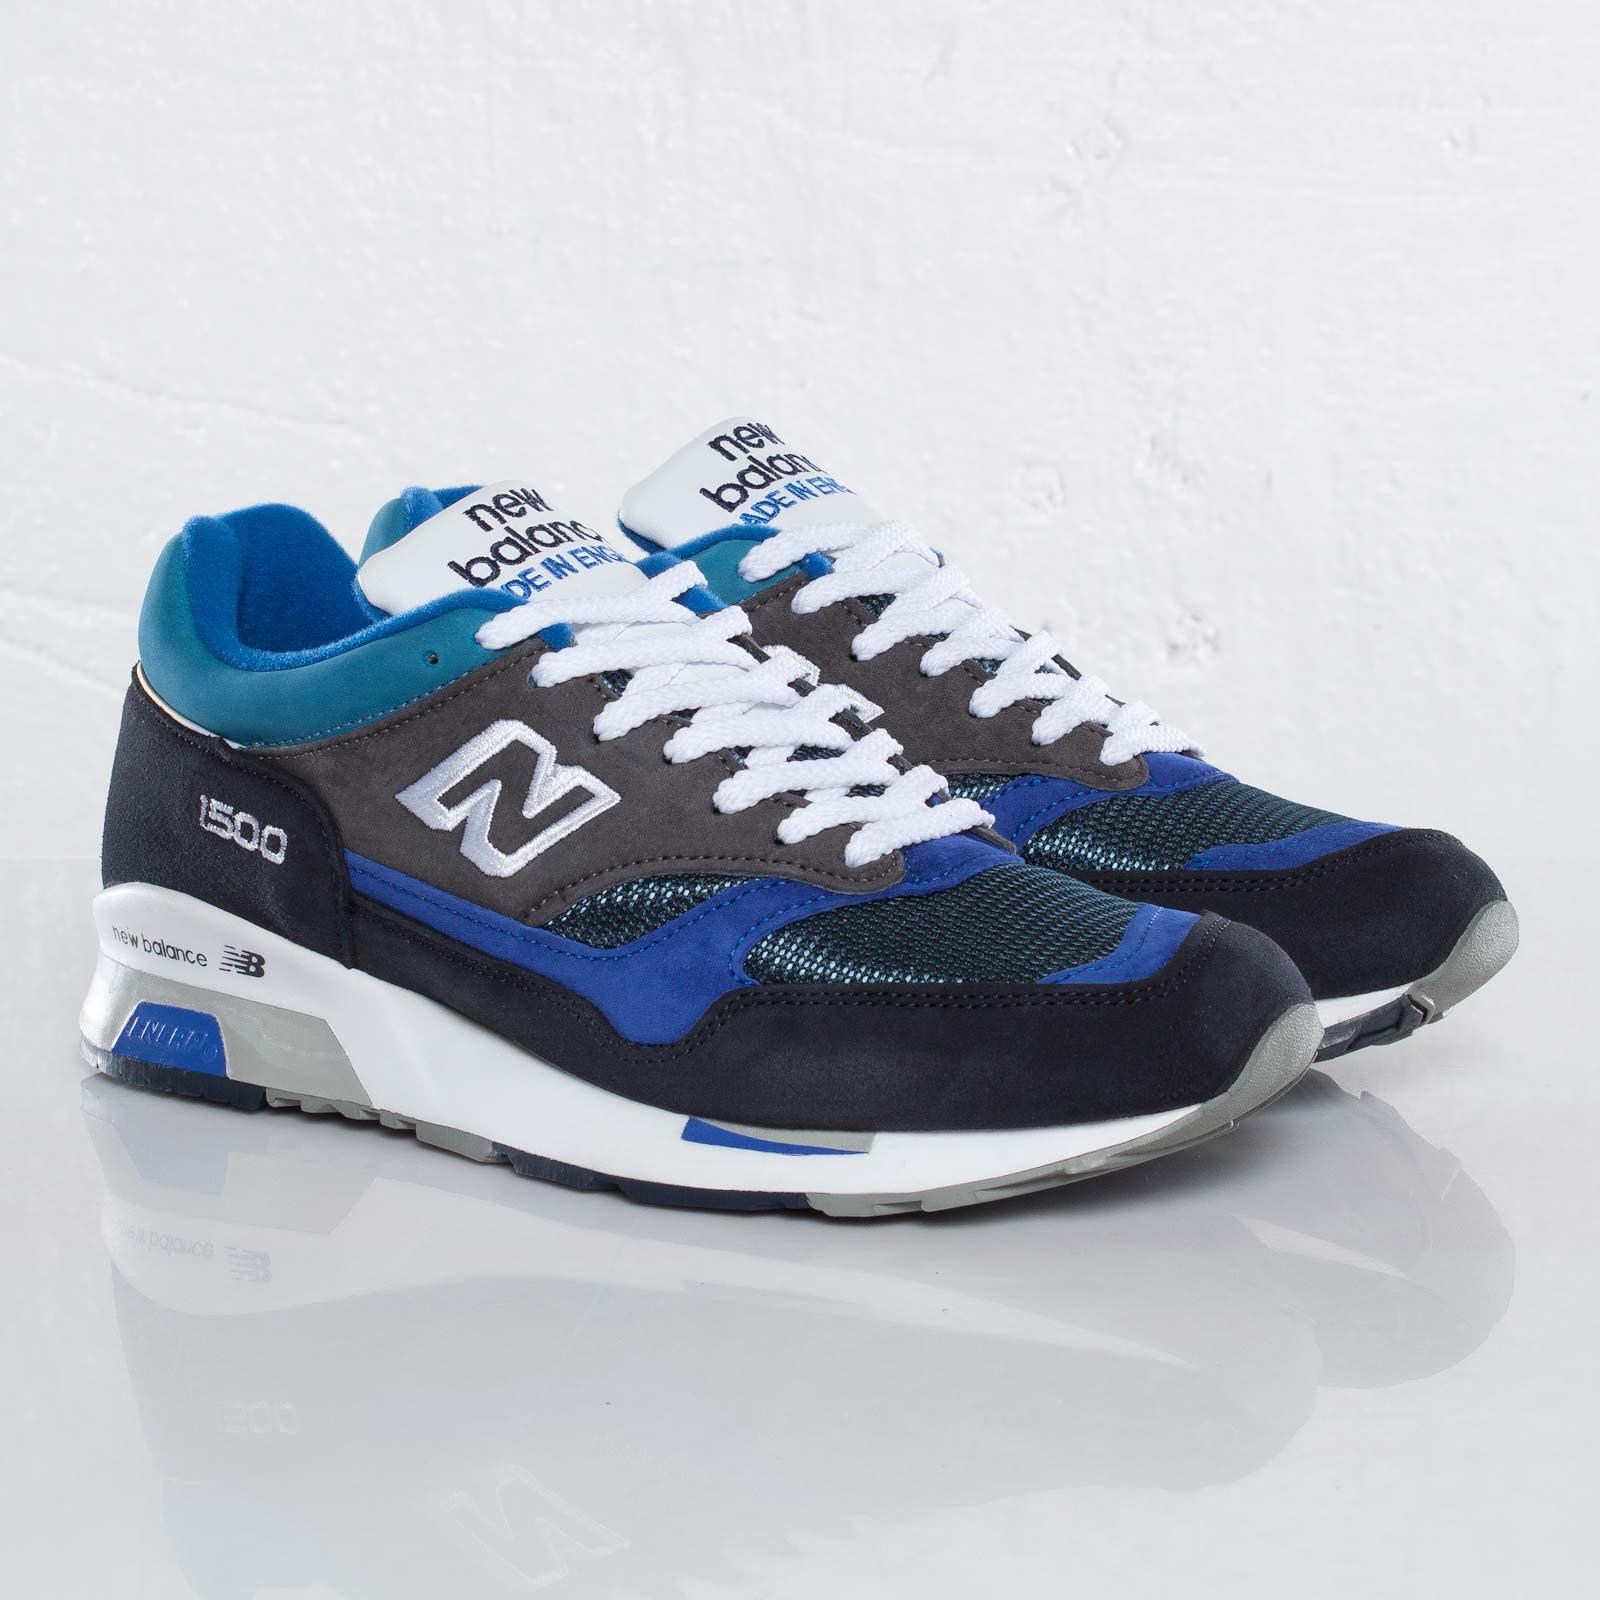 New Balance M1500 - M1500chf - SNS   sneakers & streetwear online ...